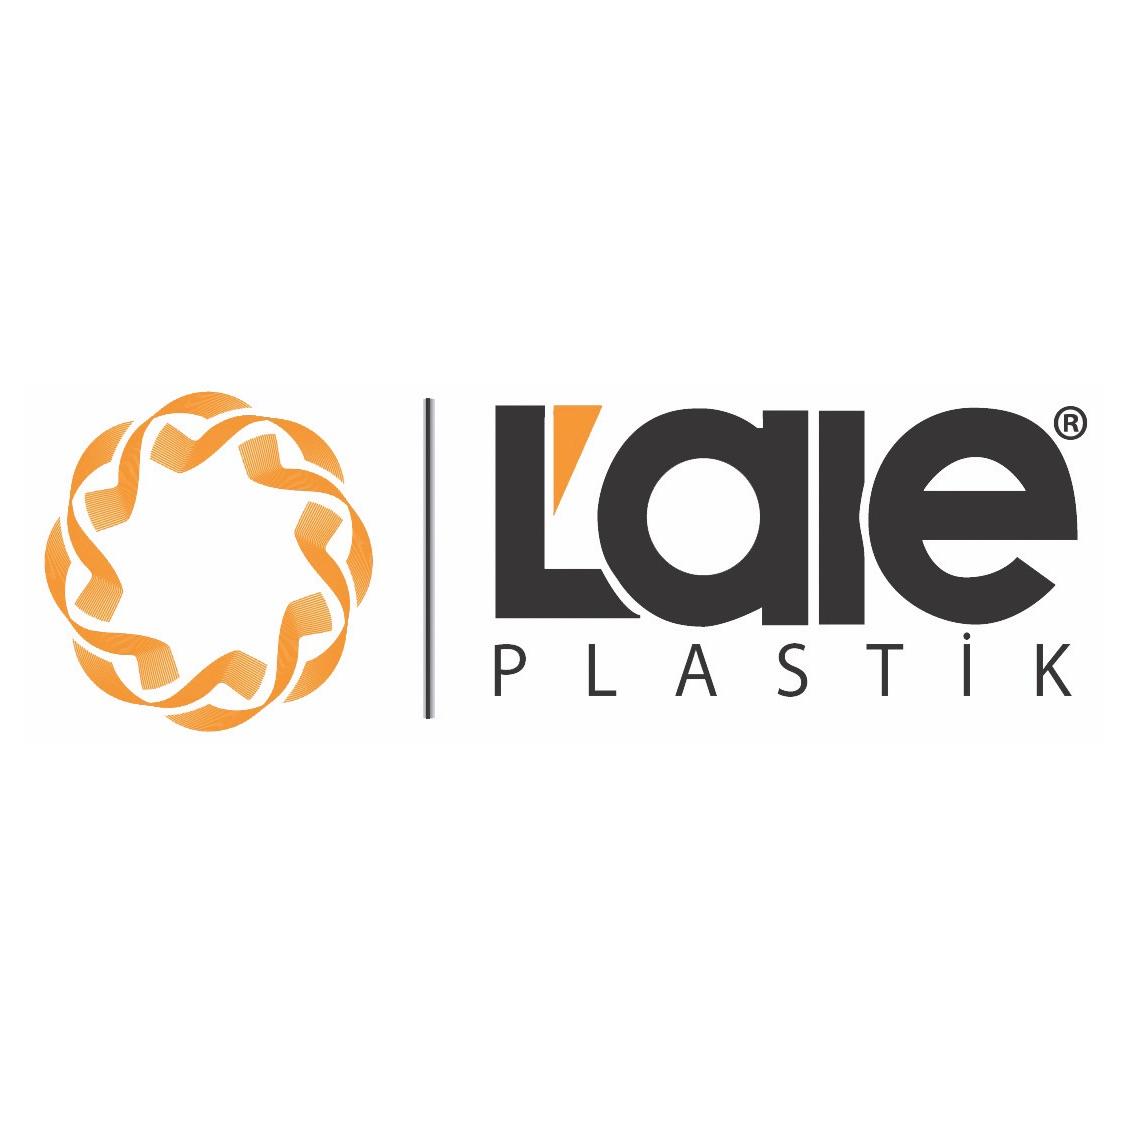 Lale Kalıp Kauçuk Plastik Kağıt SAn. Tic. ve Ltd. Şti.